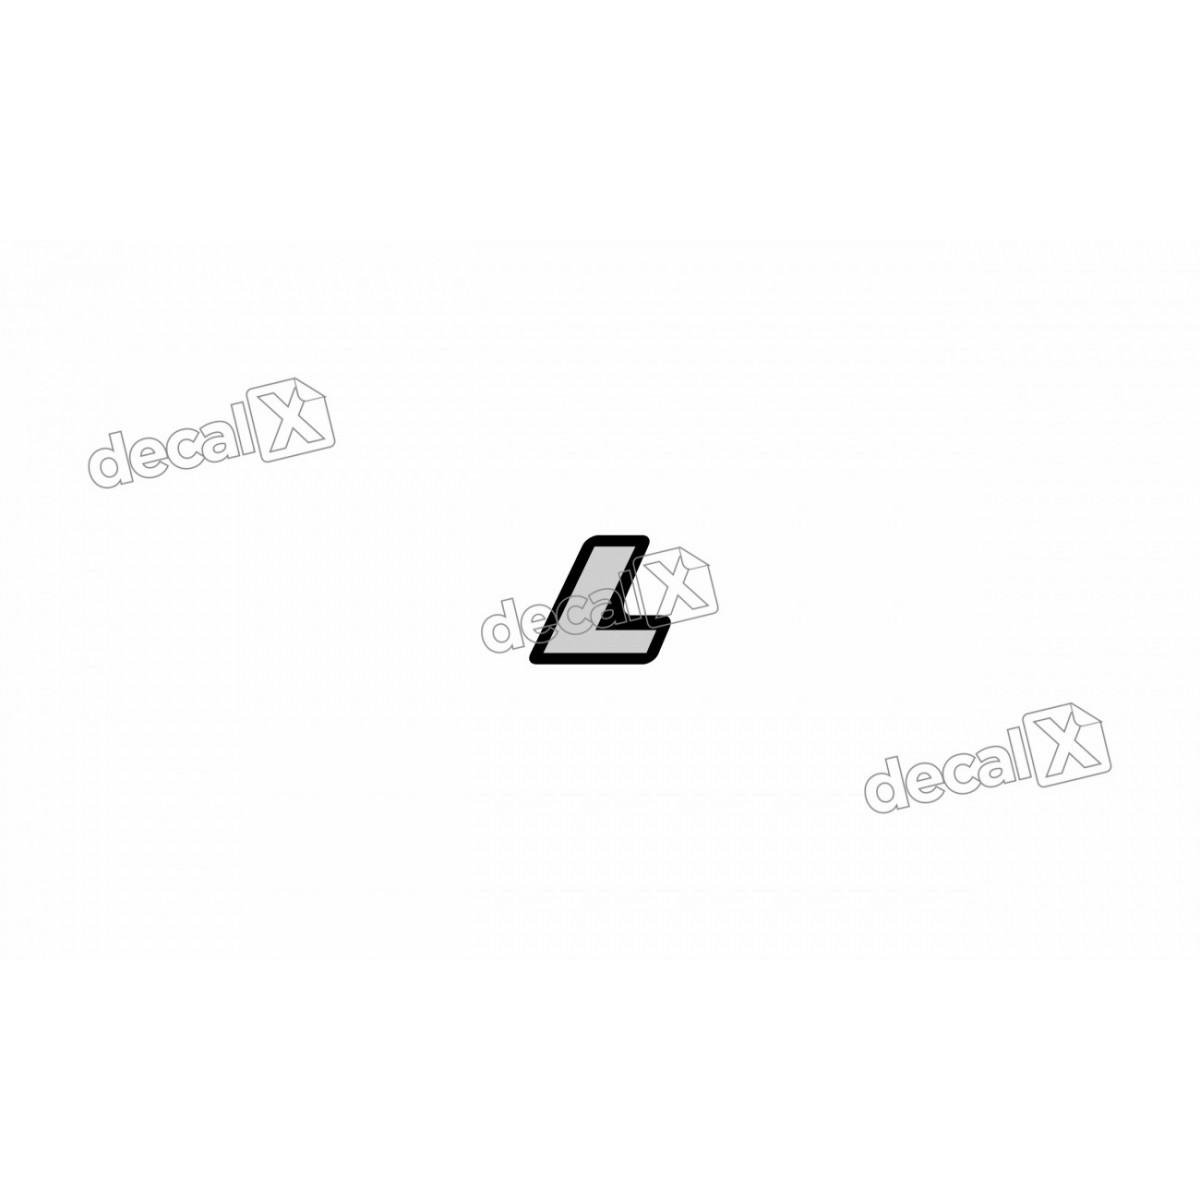 Adesivo Emblema Resinado Mercedes L Cm97 Decalx